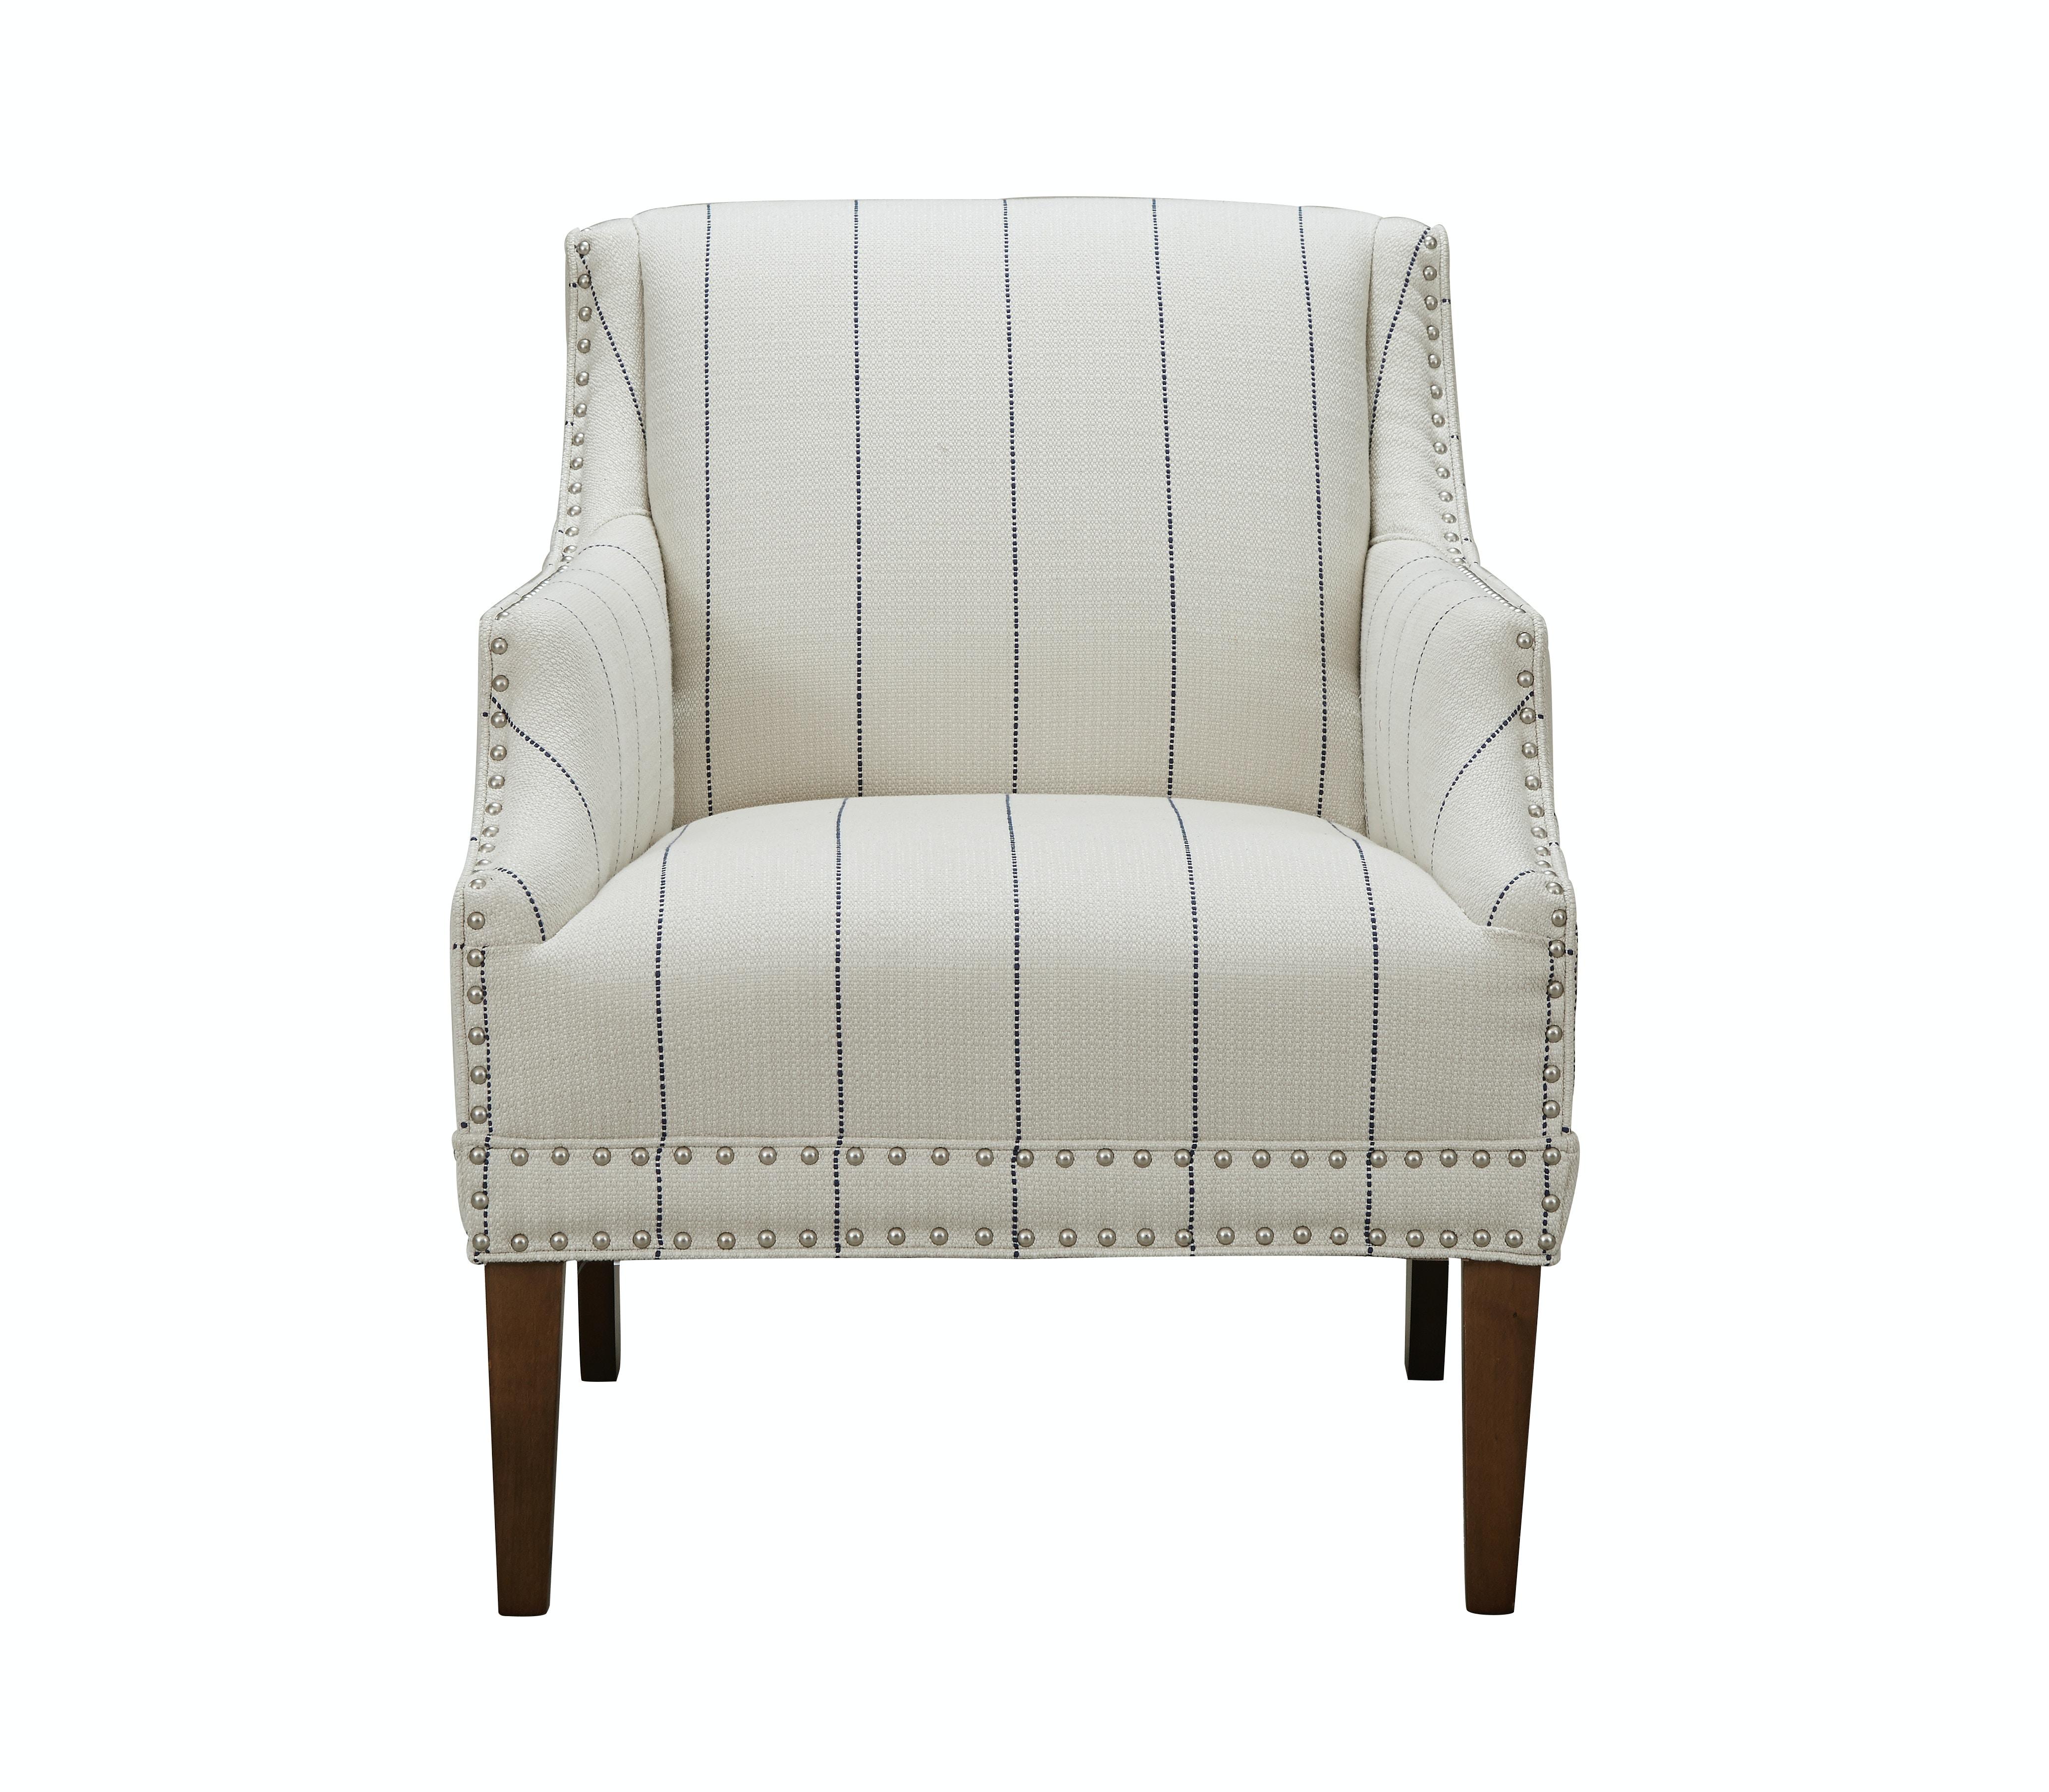 Charmant Southern Furniture Stella Chair 24553